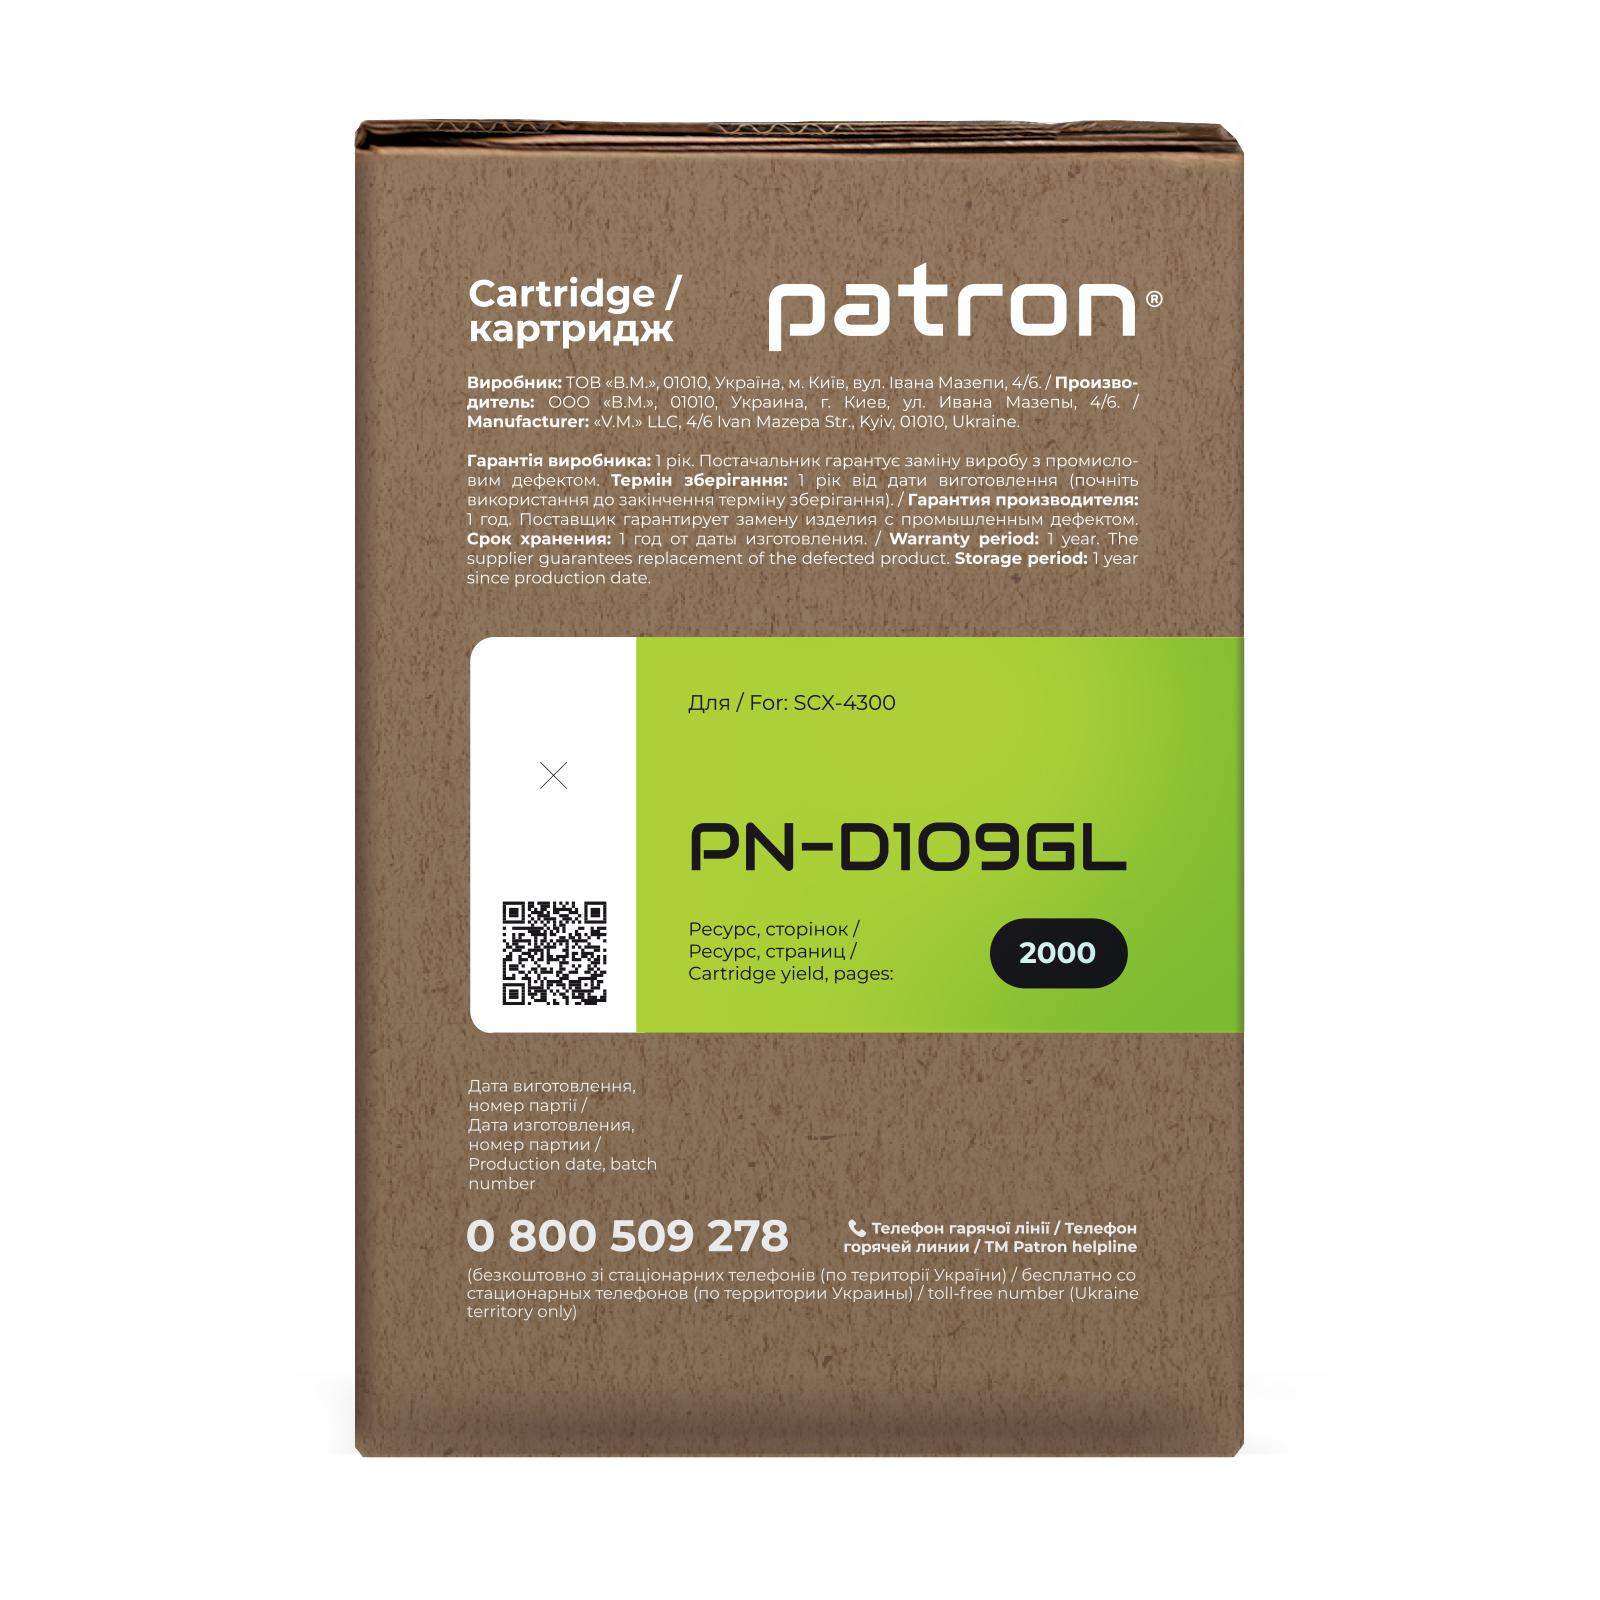 Картридж Patron SAMSUNG MLT-D109S GREEN Label (PN-D109GL) изображение 3